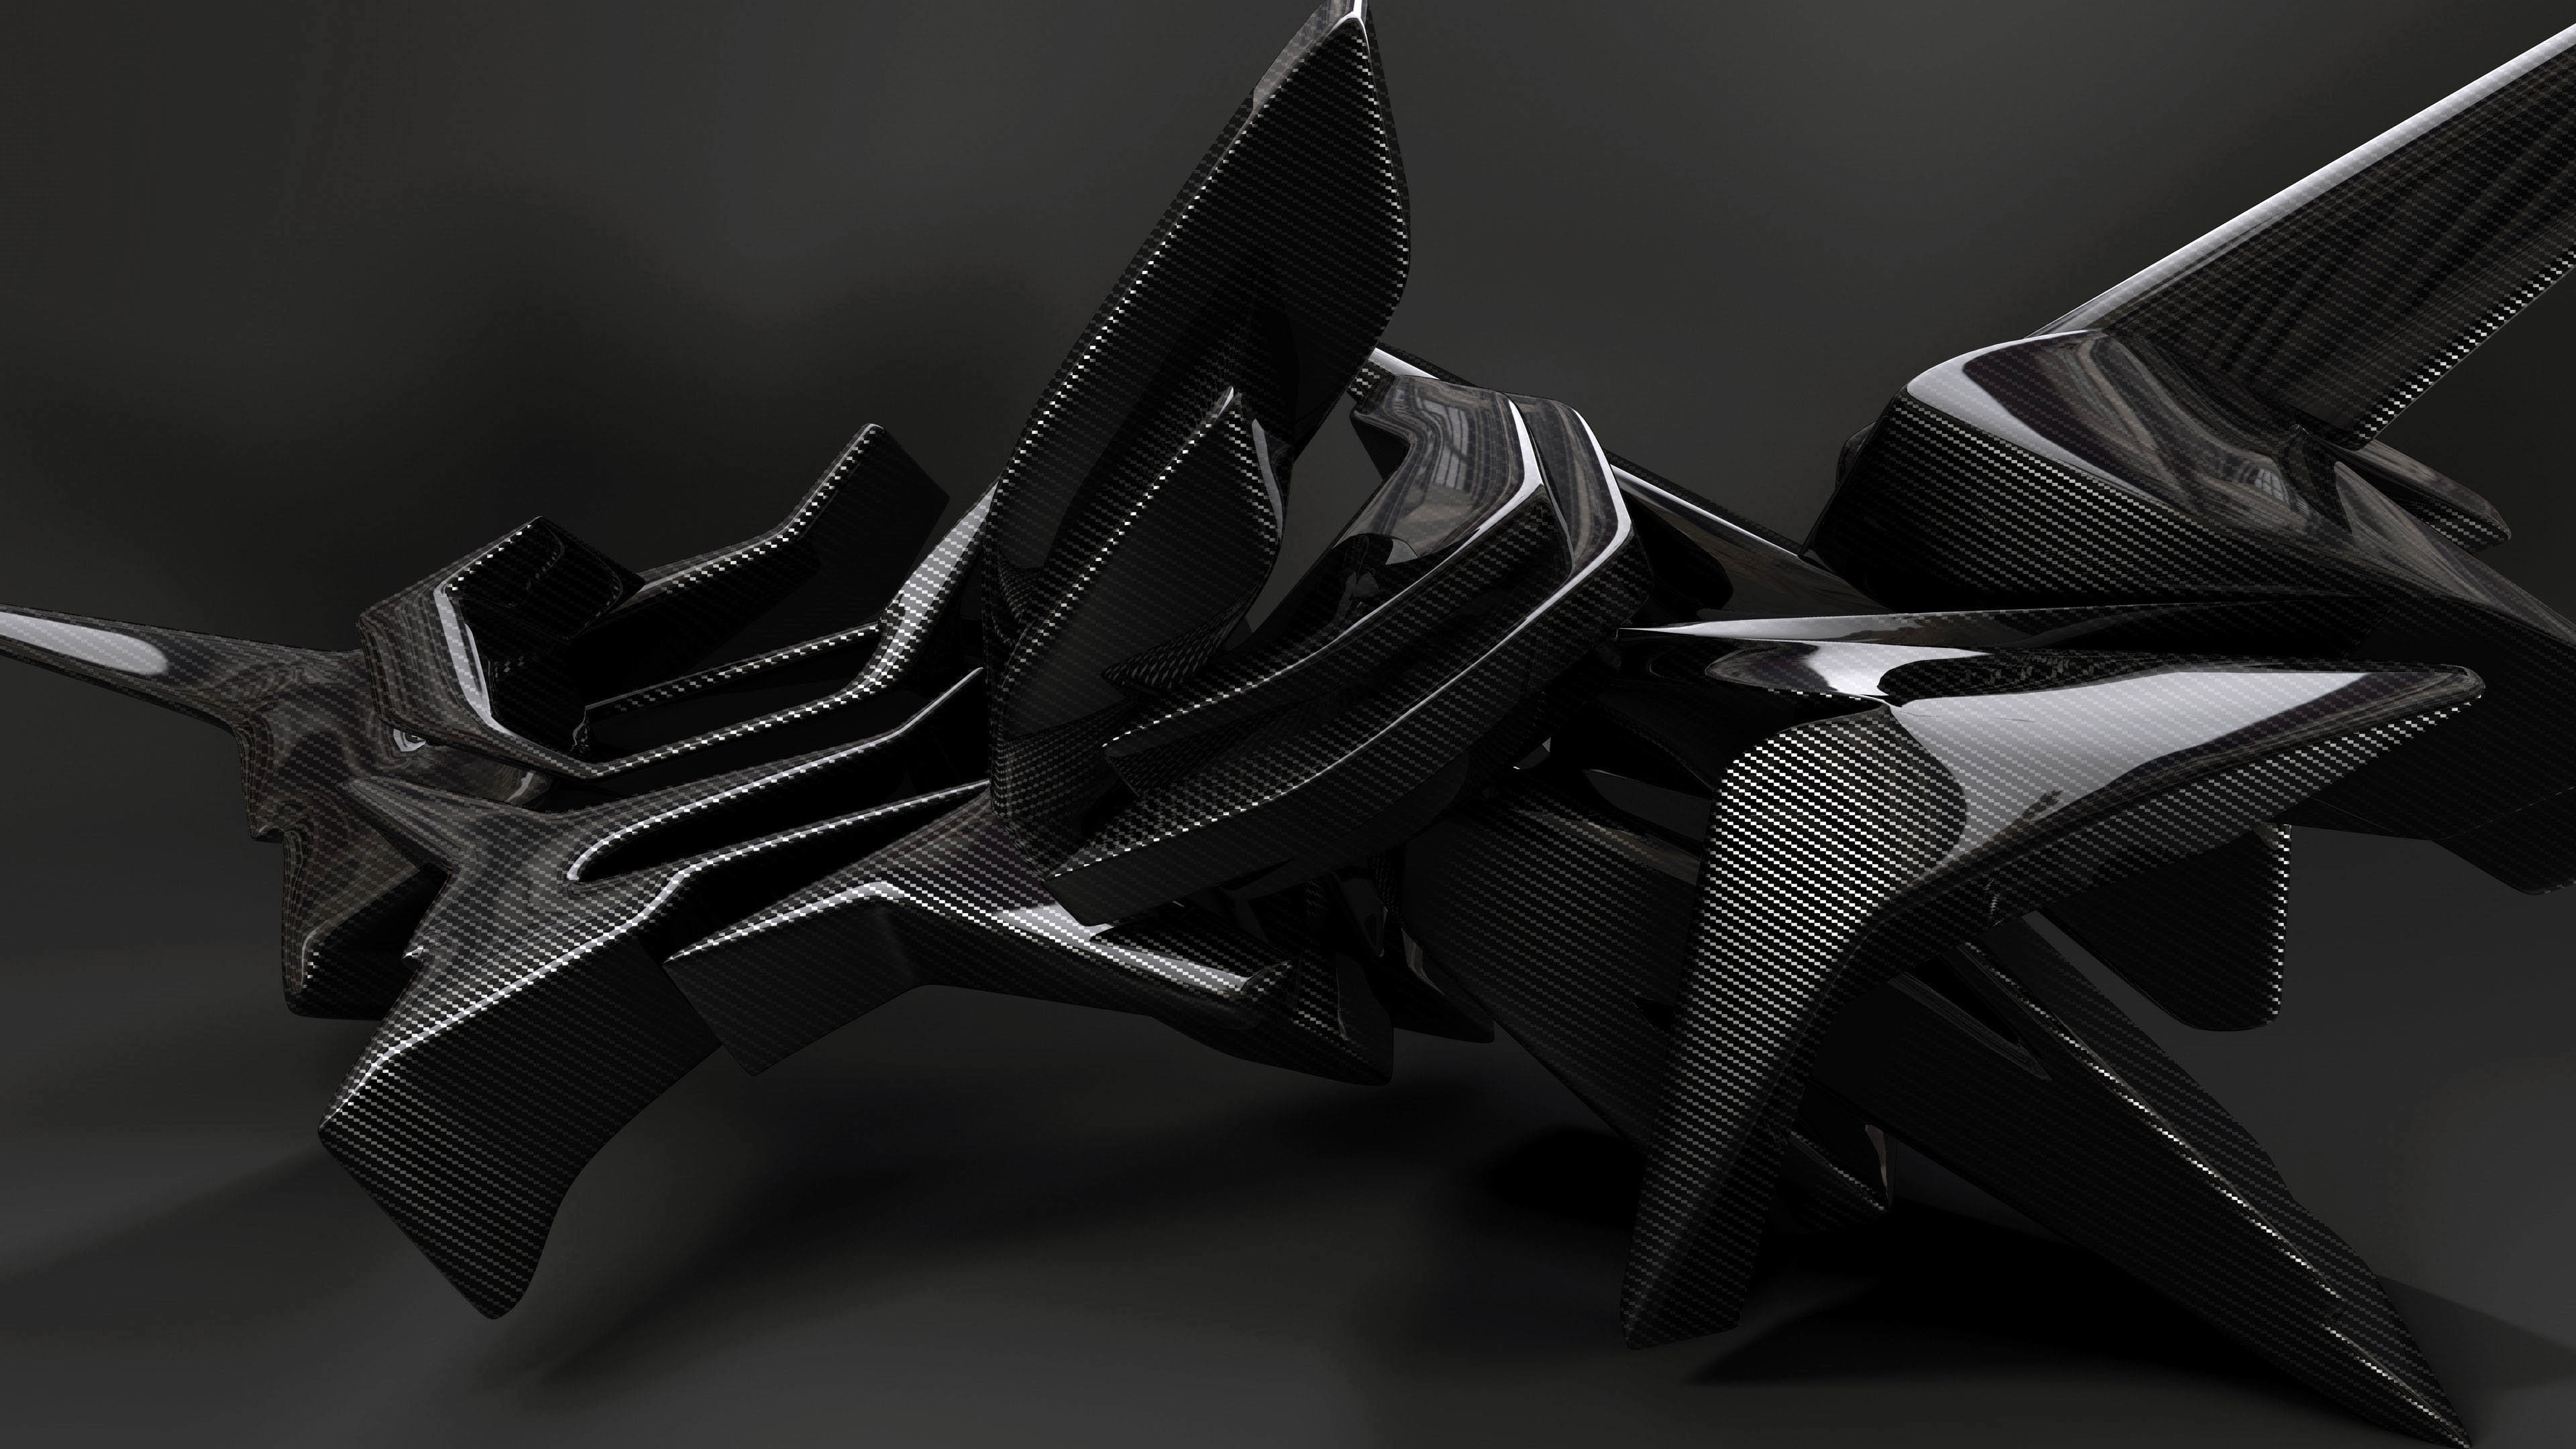 3D Carbon Element wallpaper